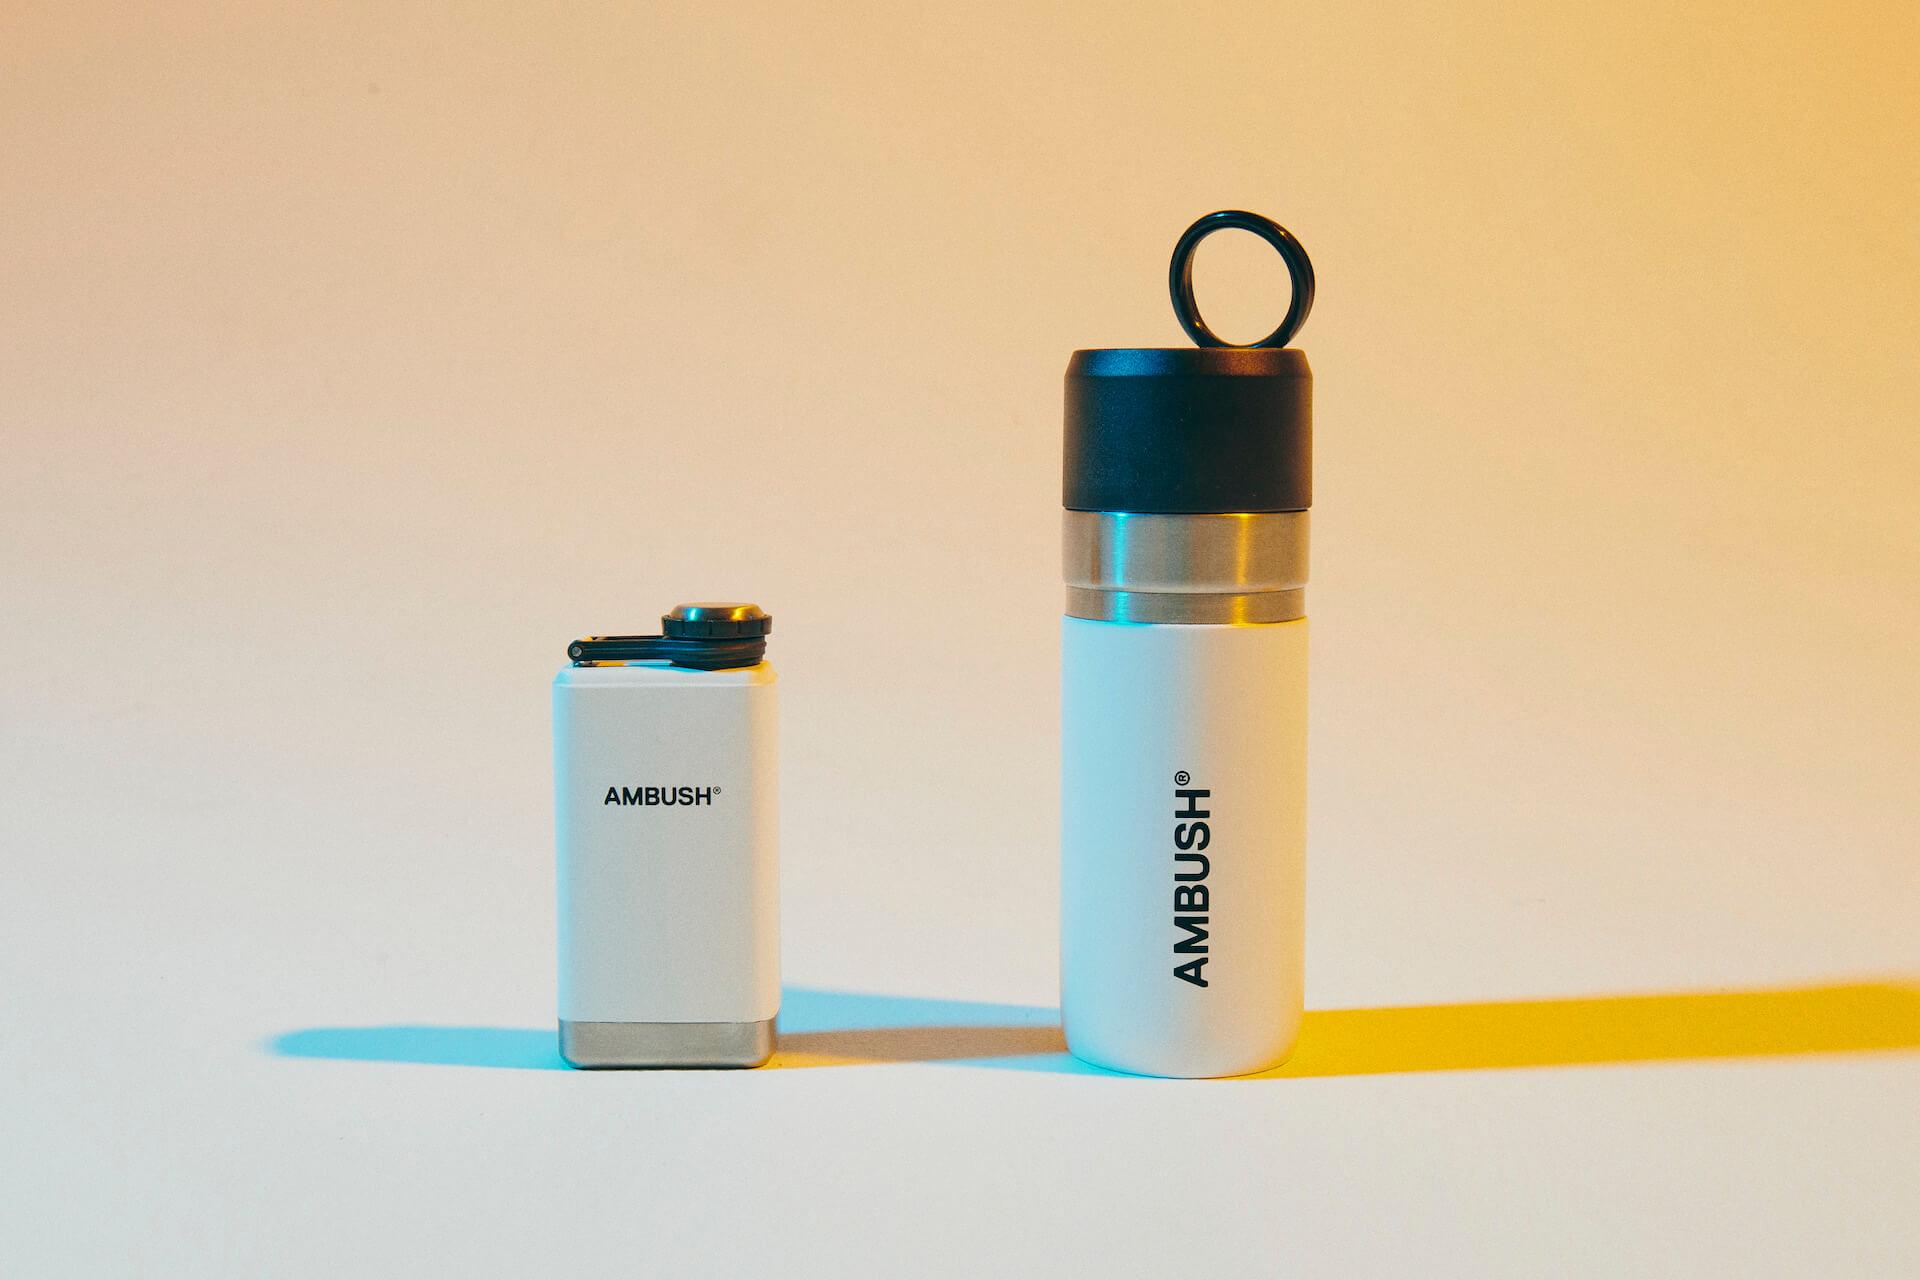 AMBUSHがPORTER、STANLEYとコラボ!真空ボトル、フラスコ、エコバックなどサスティナブルアイテムが発売決定 life210616_ambush_stanley_porter_3